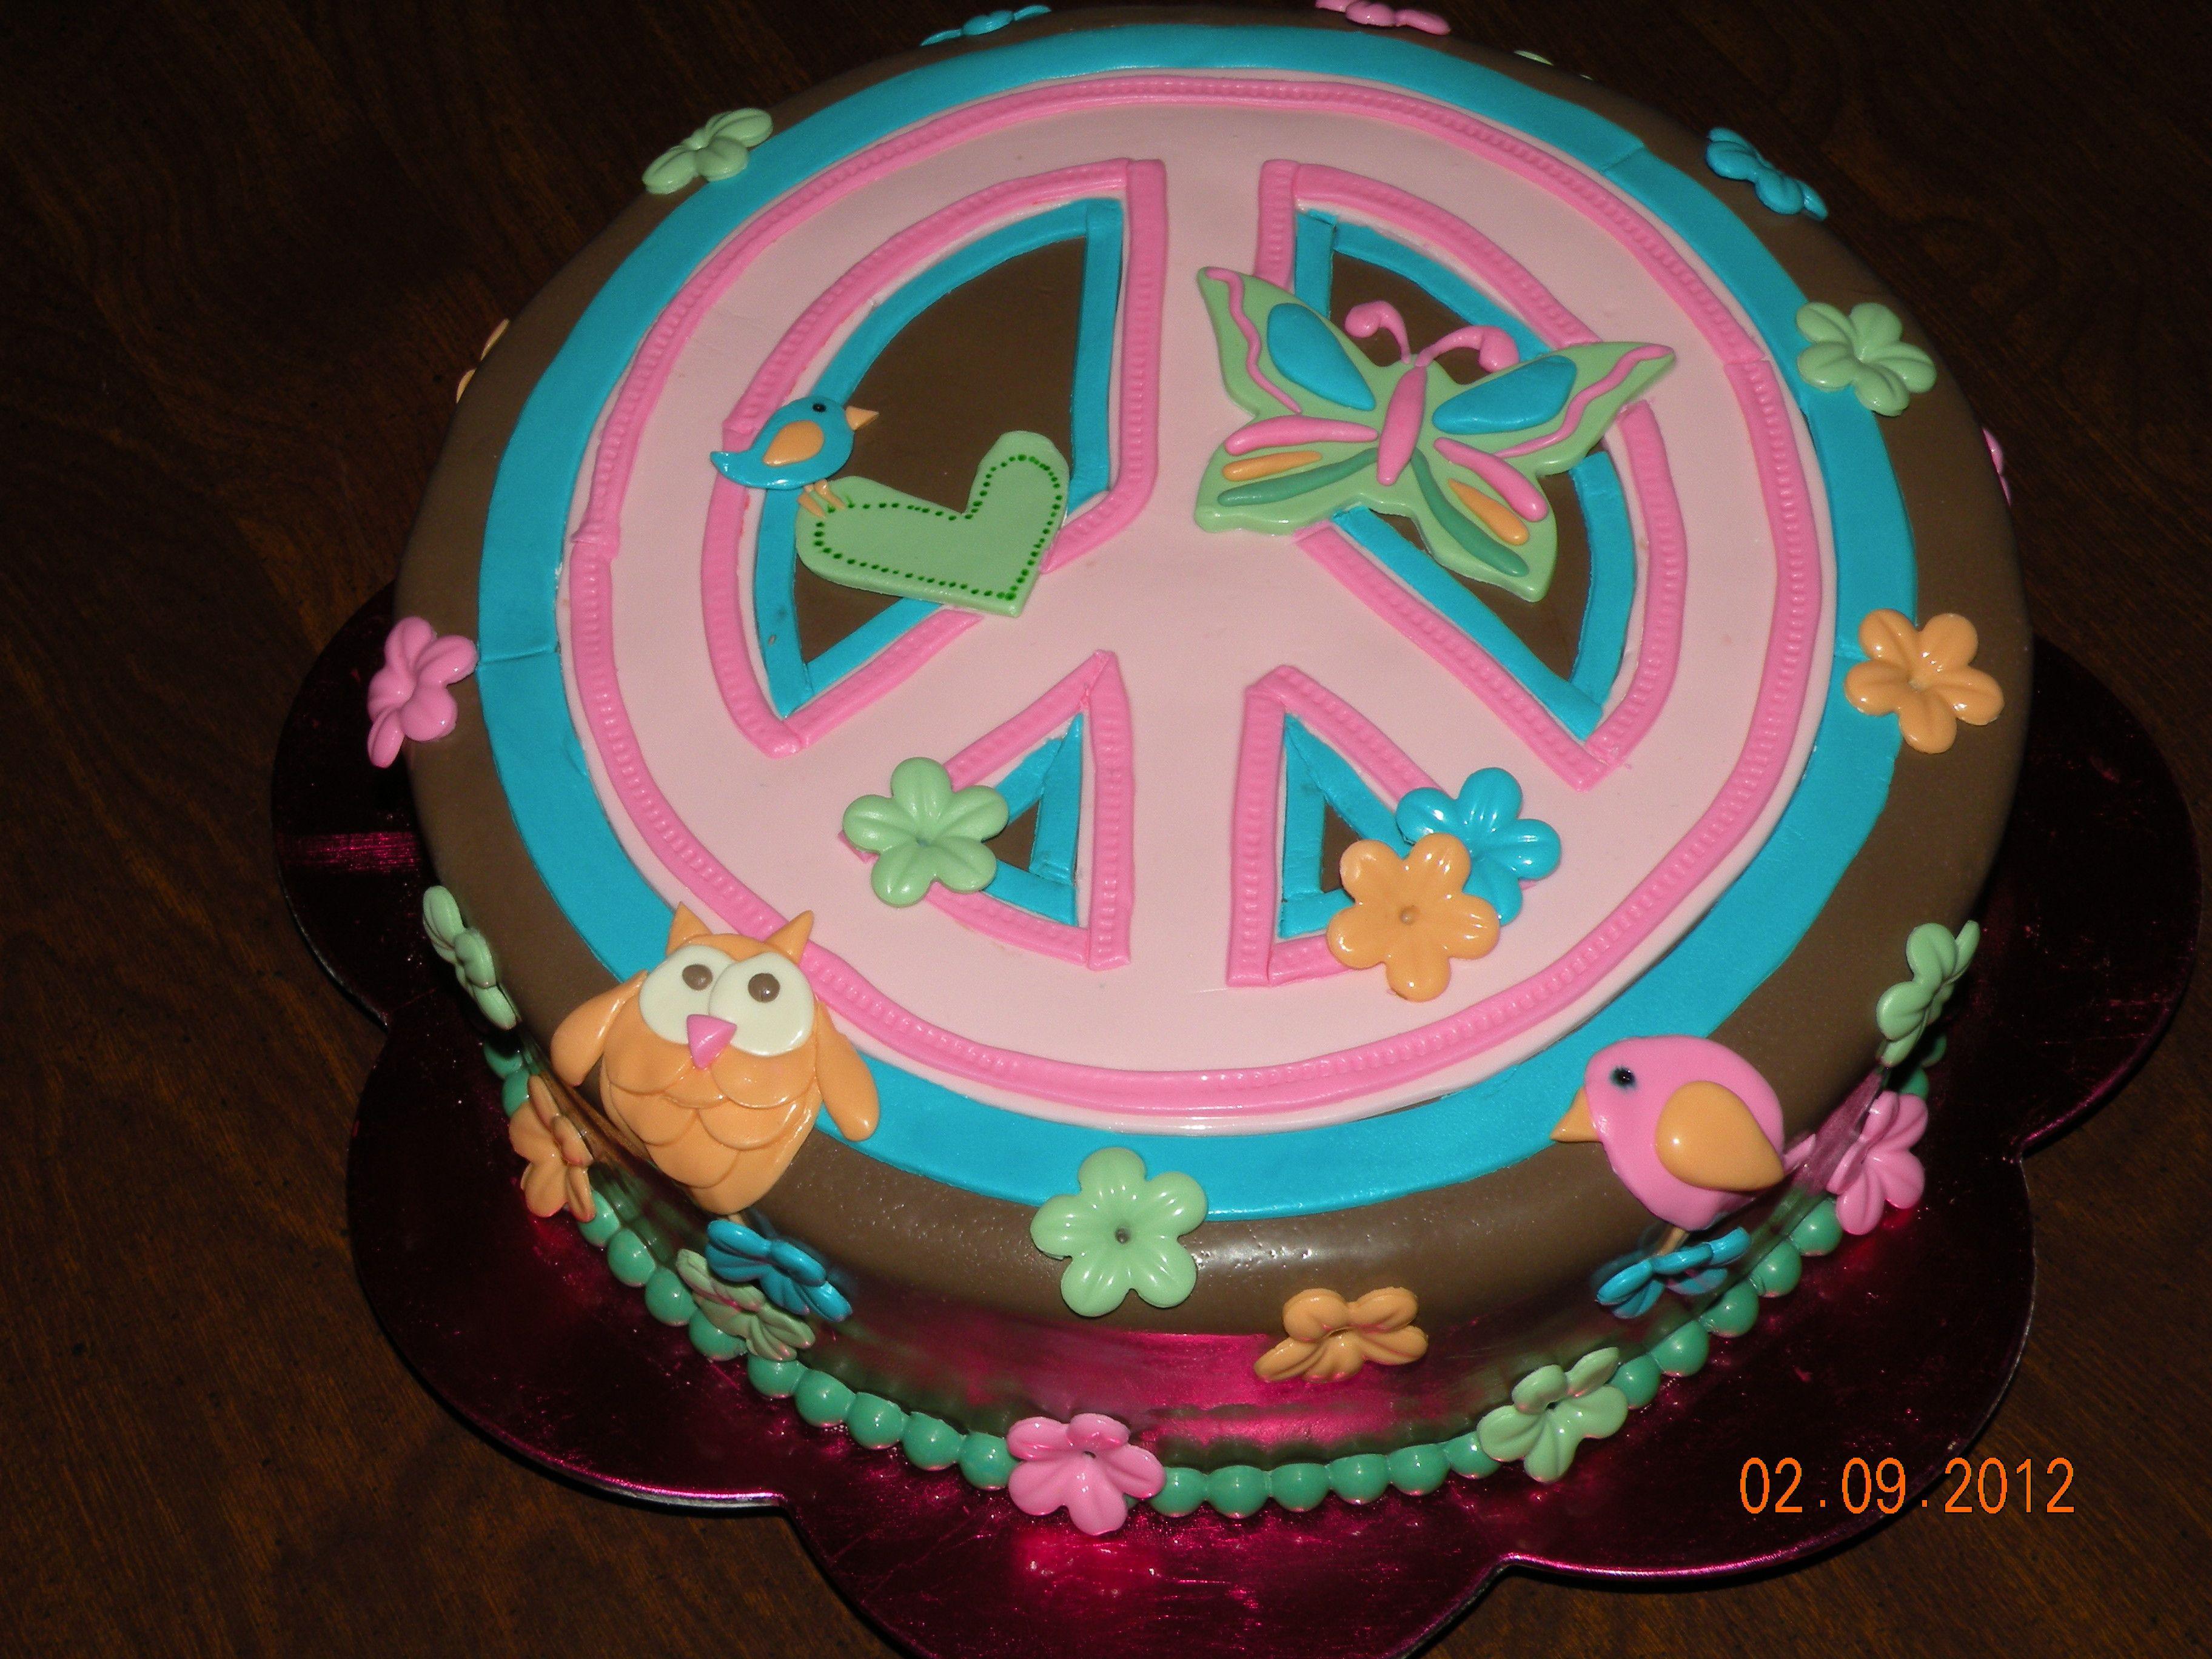 Enjoyable Peace Sign Cake Dessert Cake Recipes Unique Birthday Cakes Cake Personalised Birthday Cards Cominlily Jamesorg